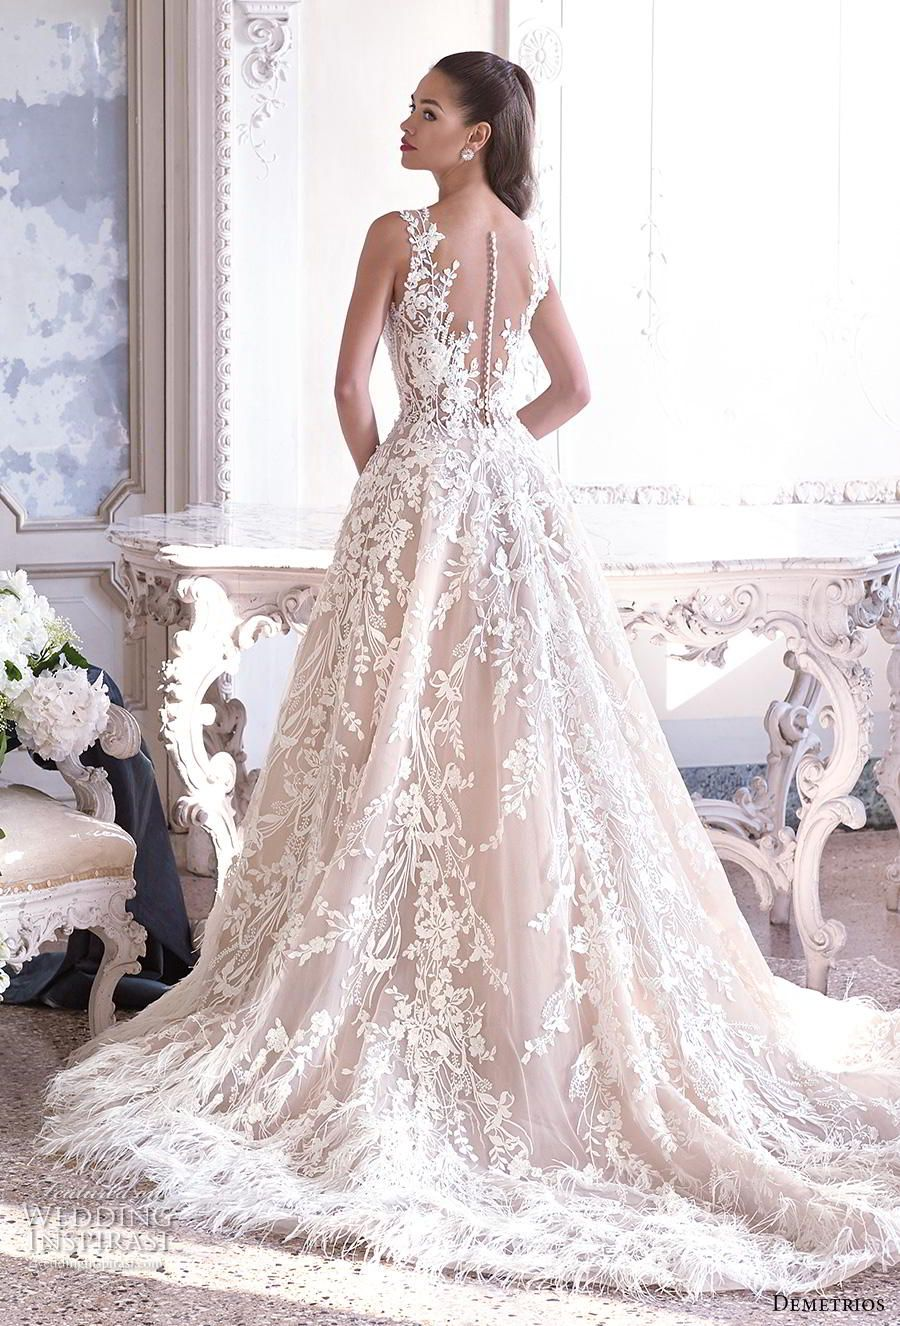 Platinum by demetrios wedding dresses blush wedding dresses